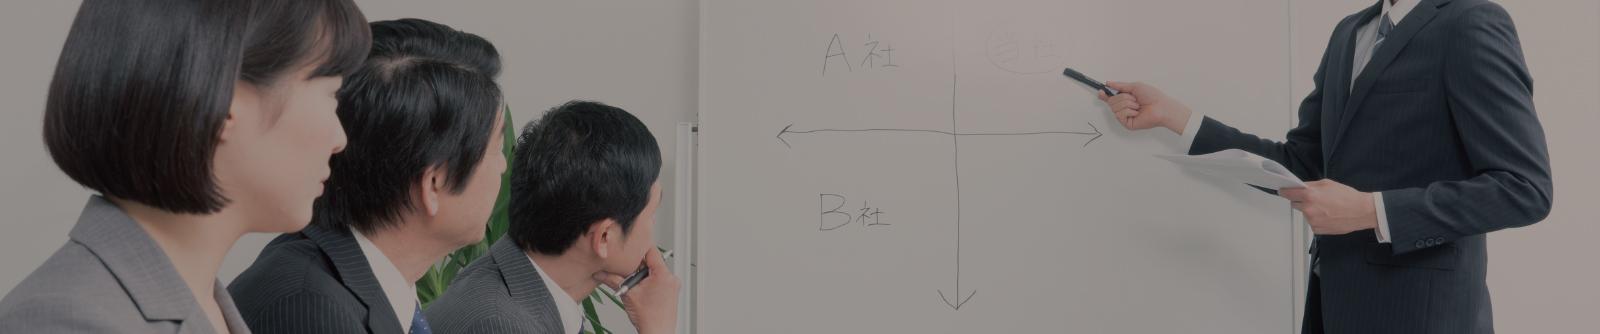 KMC 熊本 人材育成